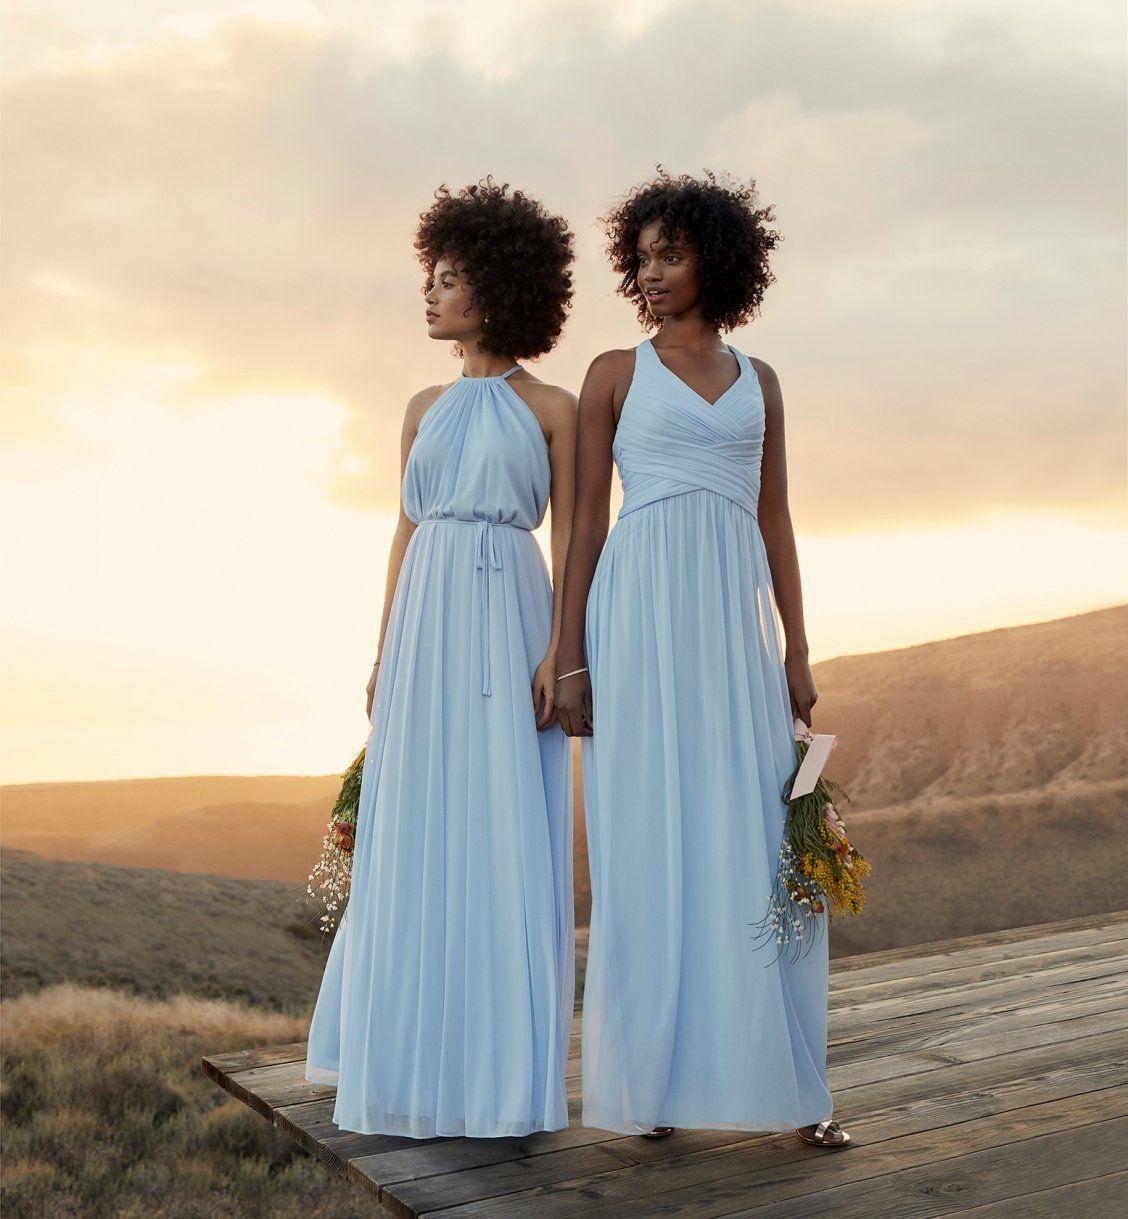 Park Art|My WordPress Blog_Ice Blue Dress For Wedding Guest